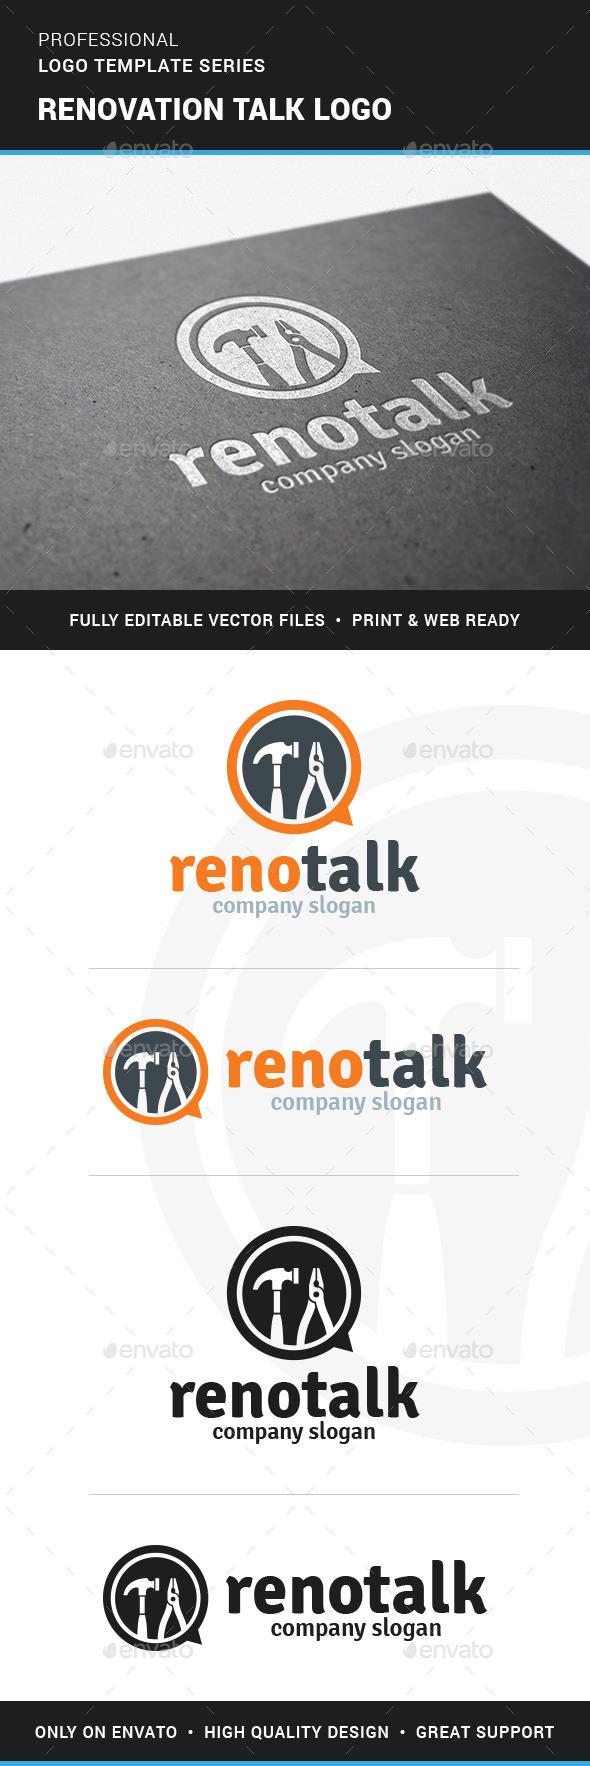 Renovation Talk Logo Template - Objects Logo Templates